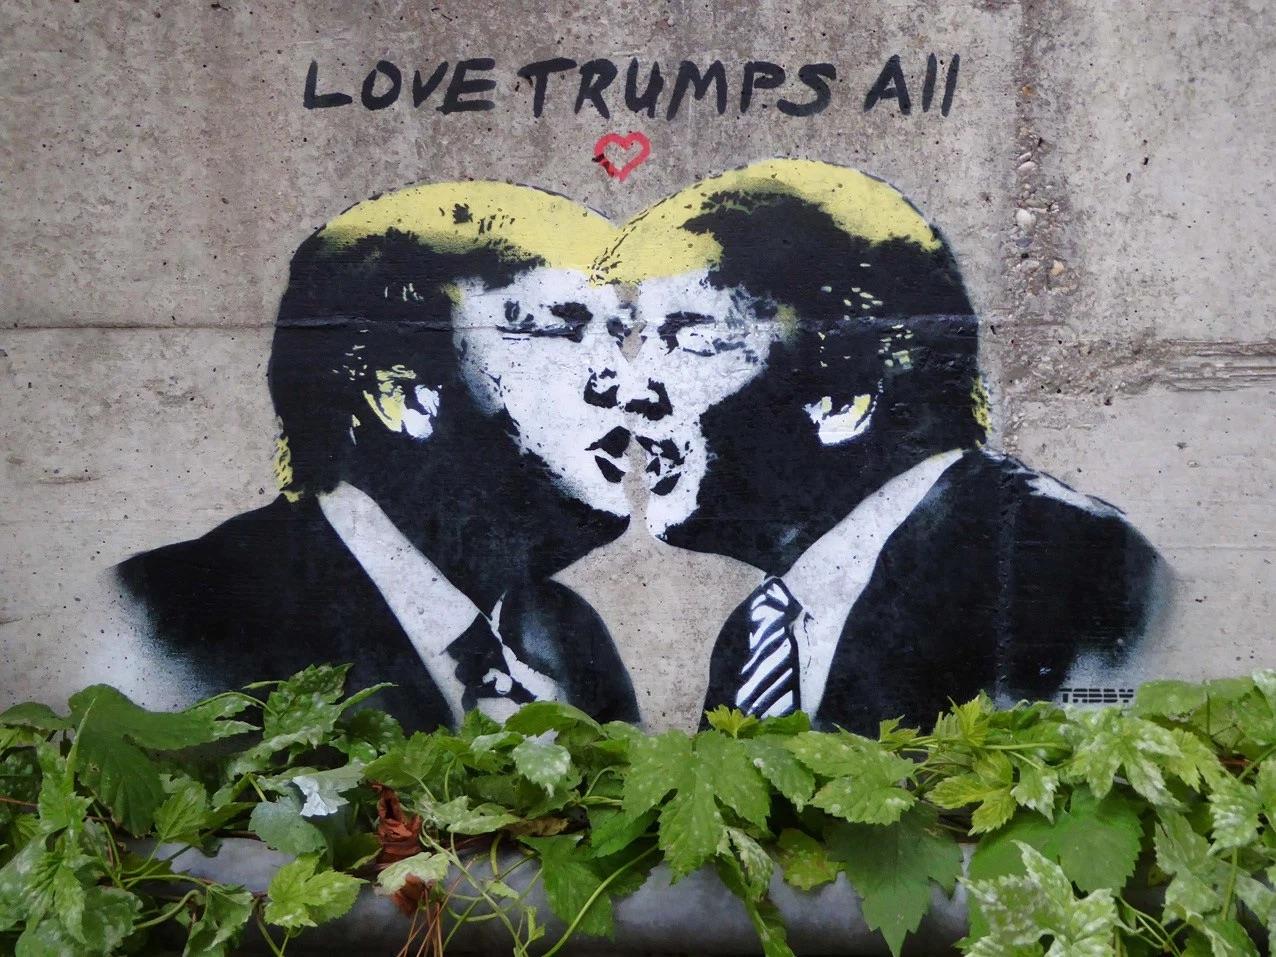 Street art by tabby at tabbythis.com